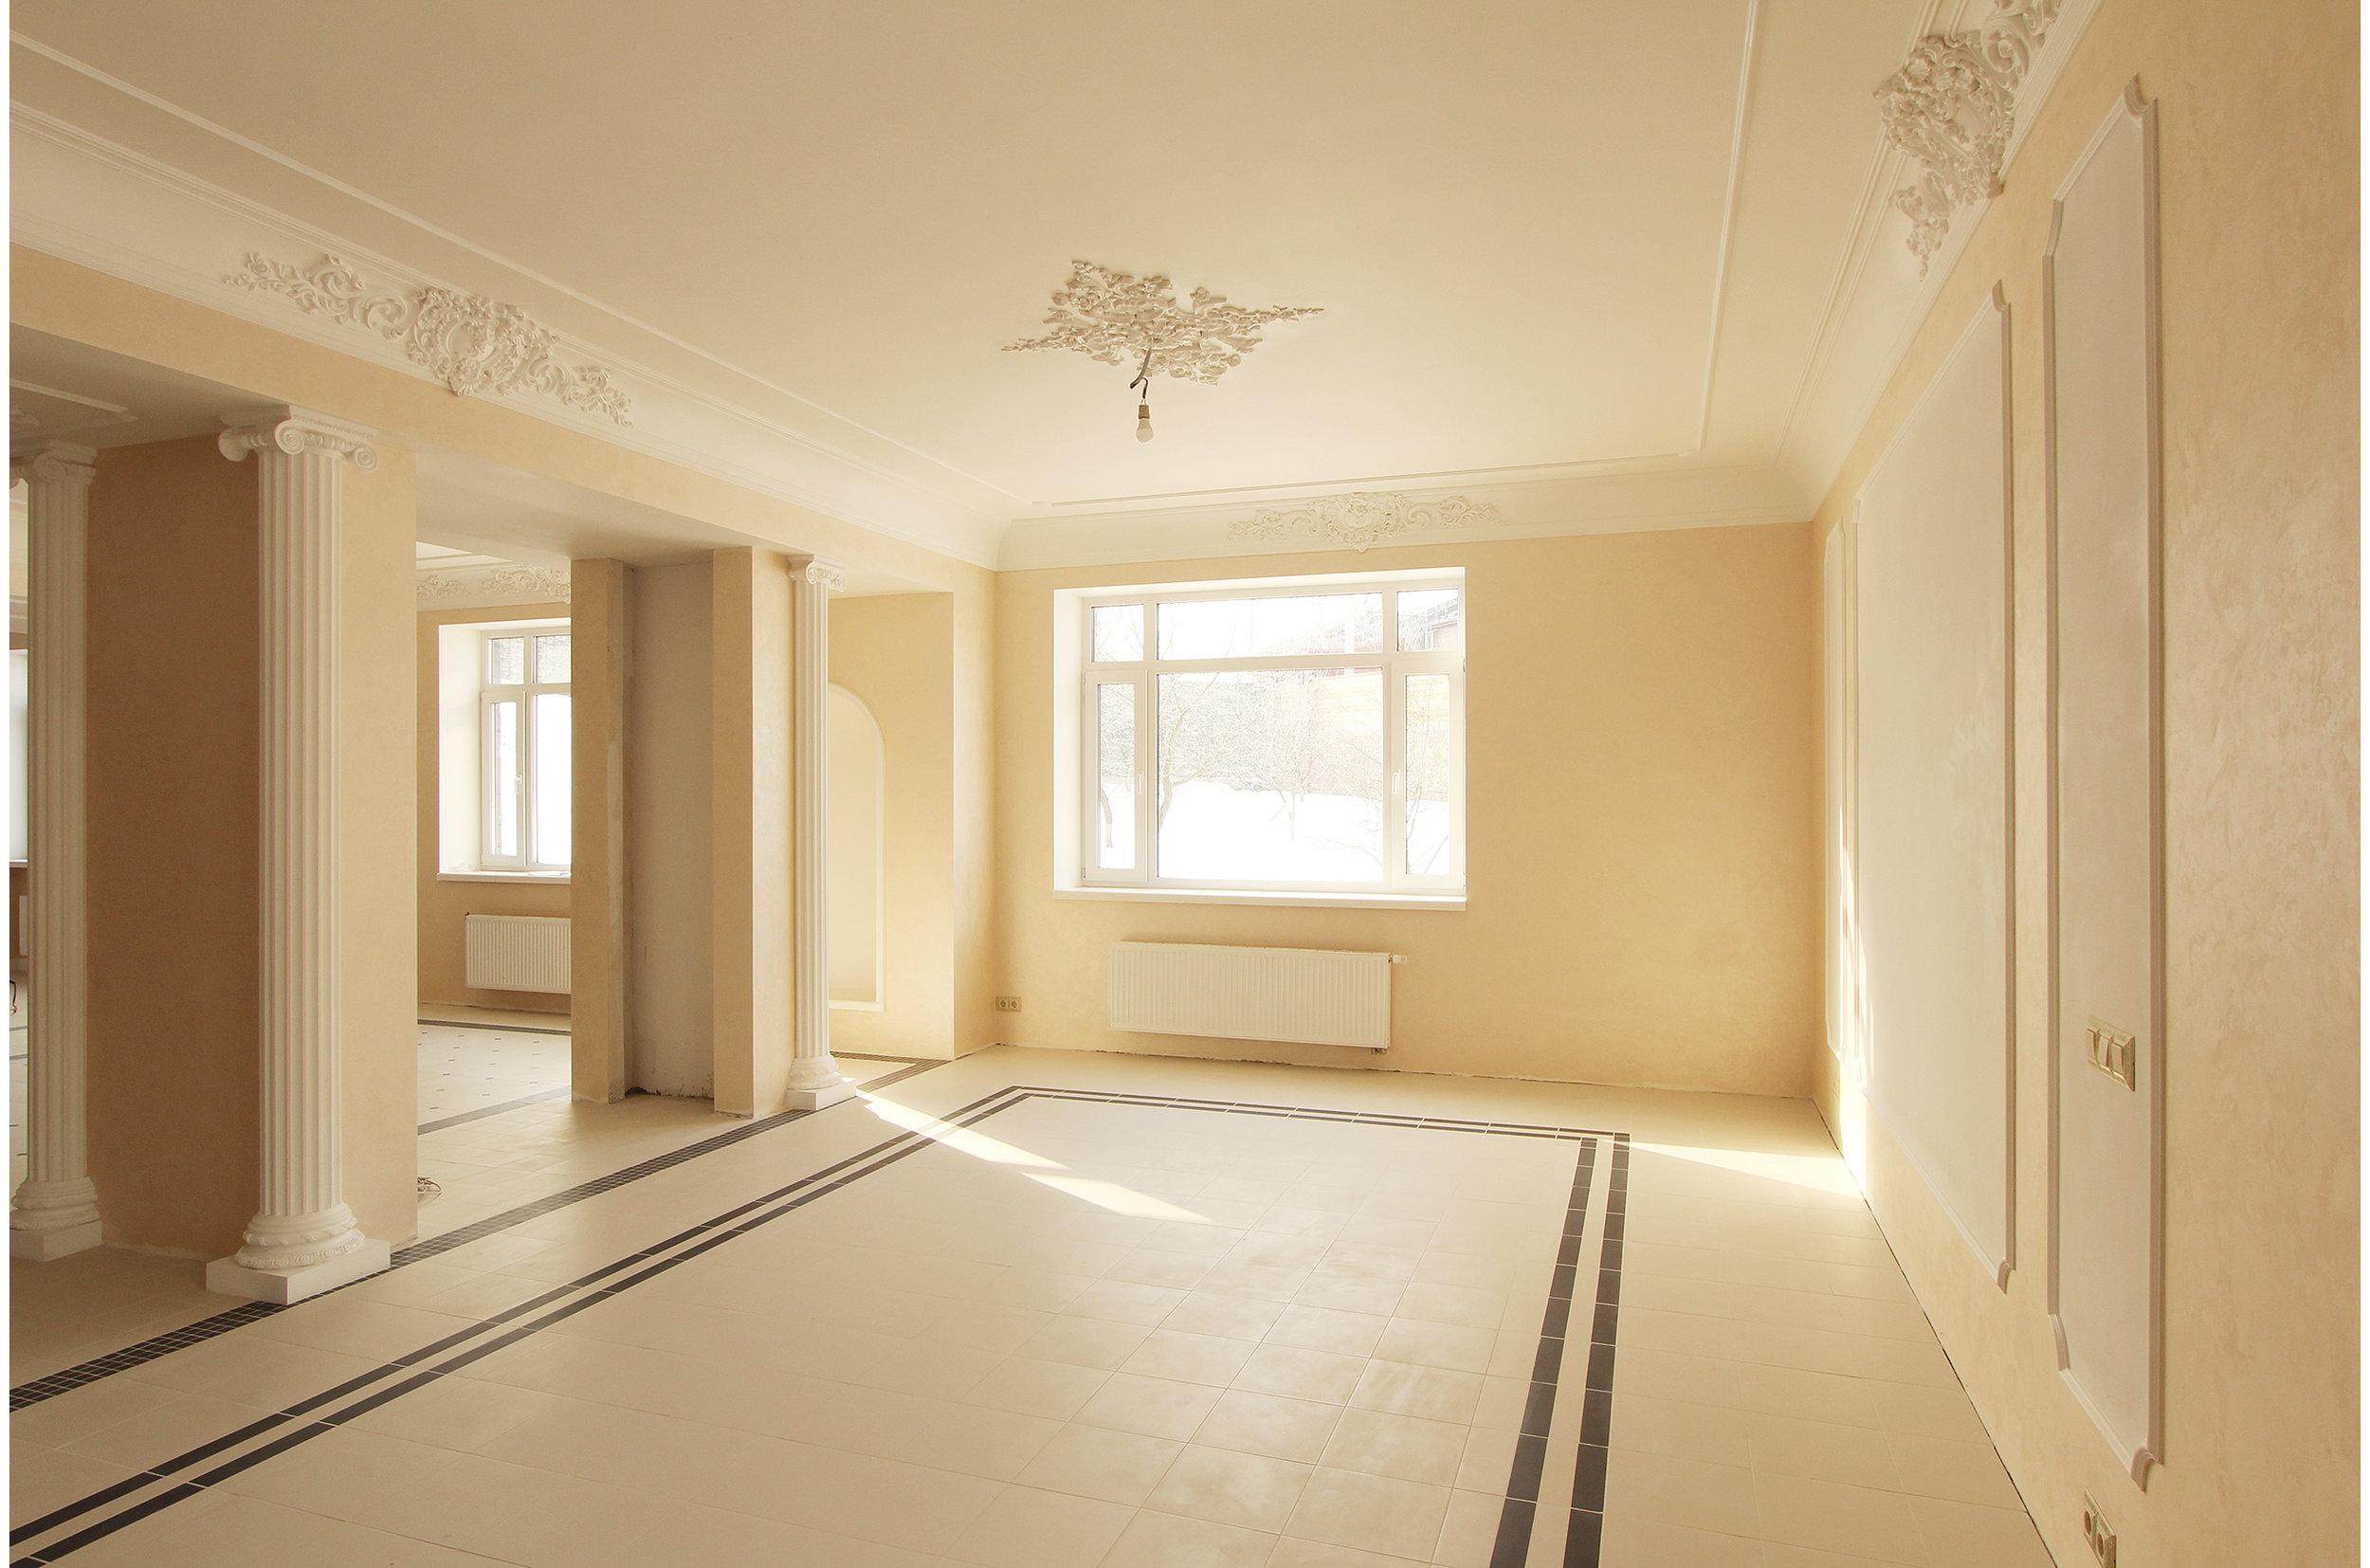 Copy of Classical interior